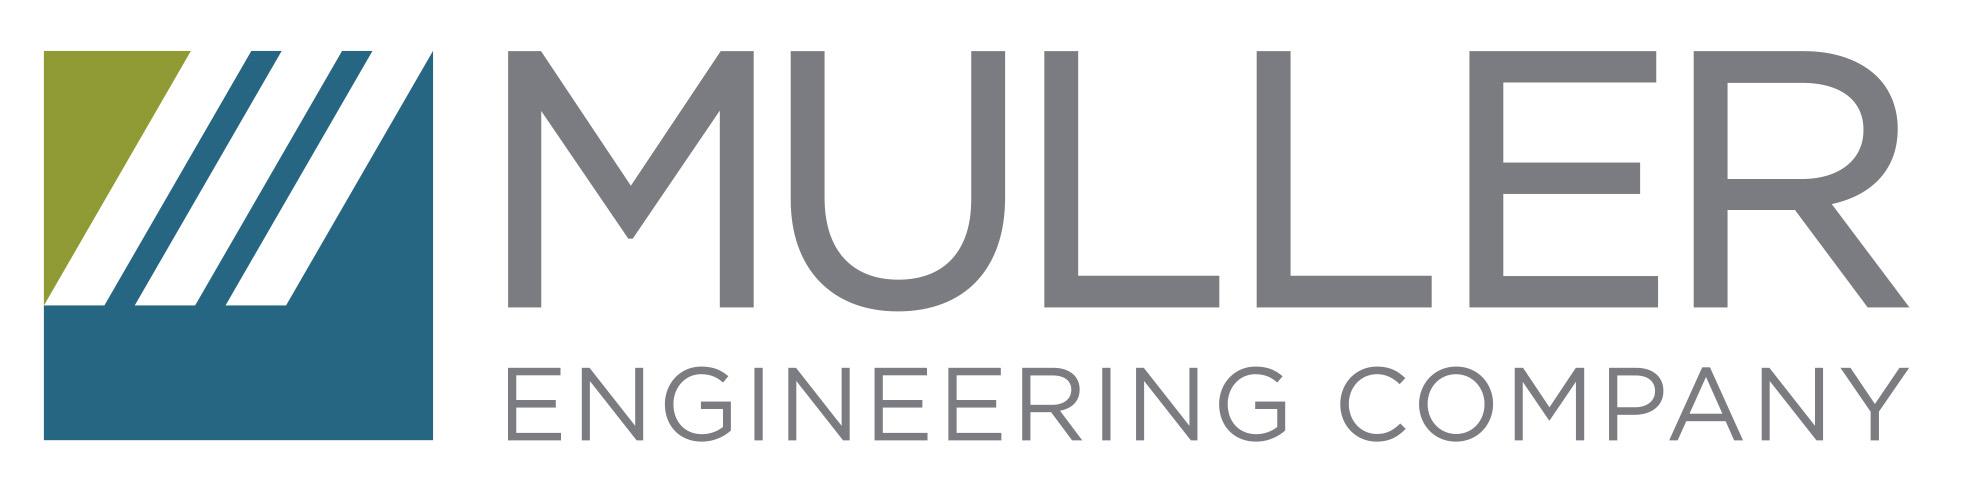 Muller Engineering Company